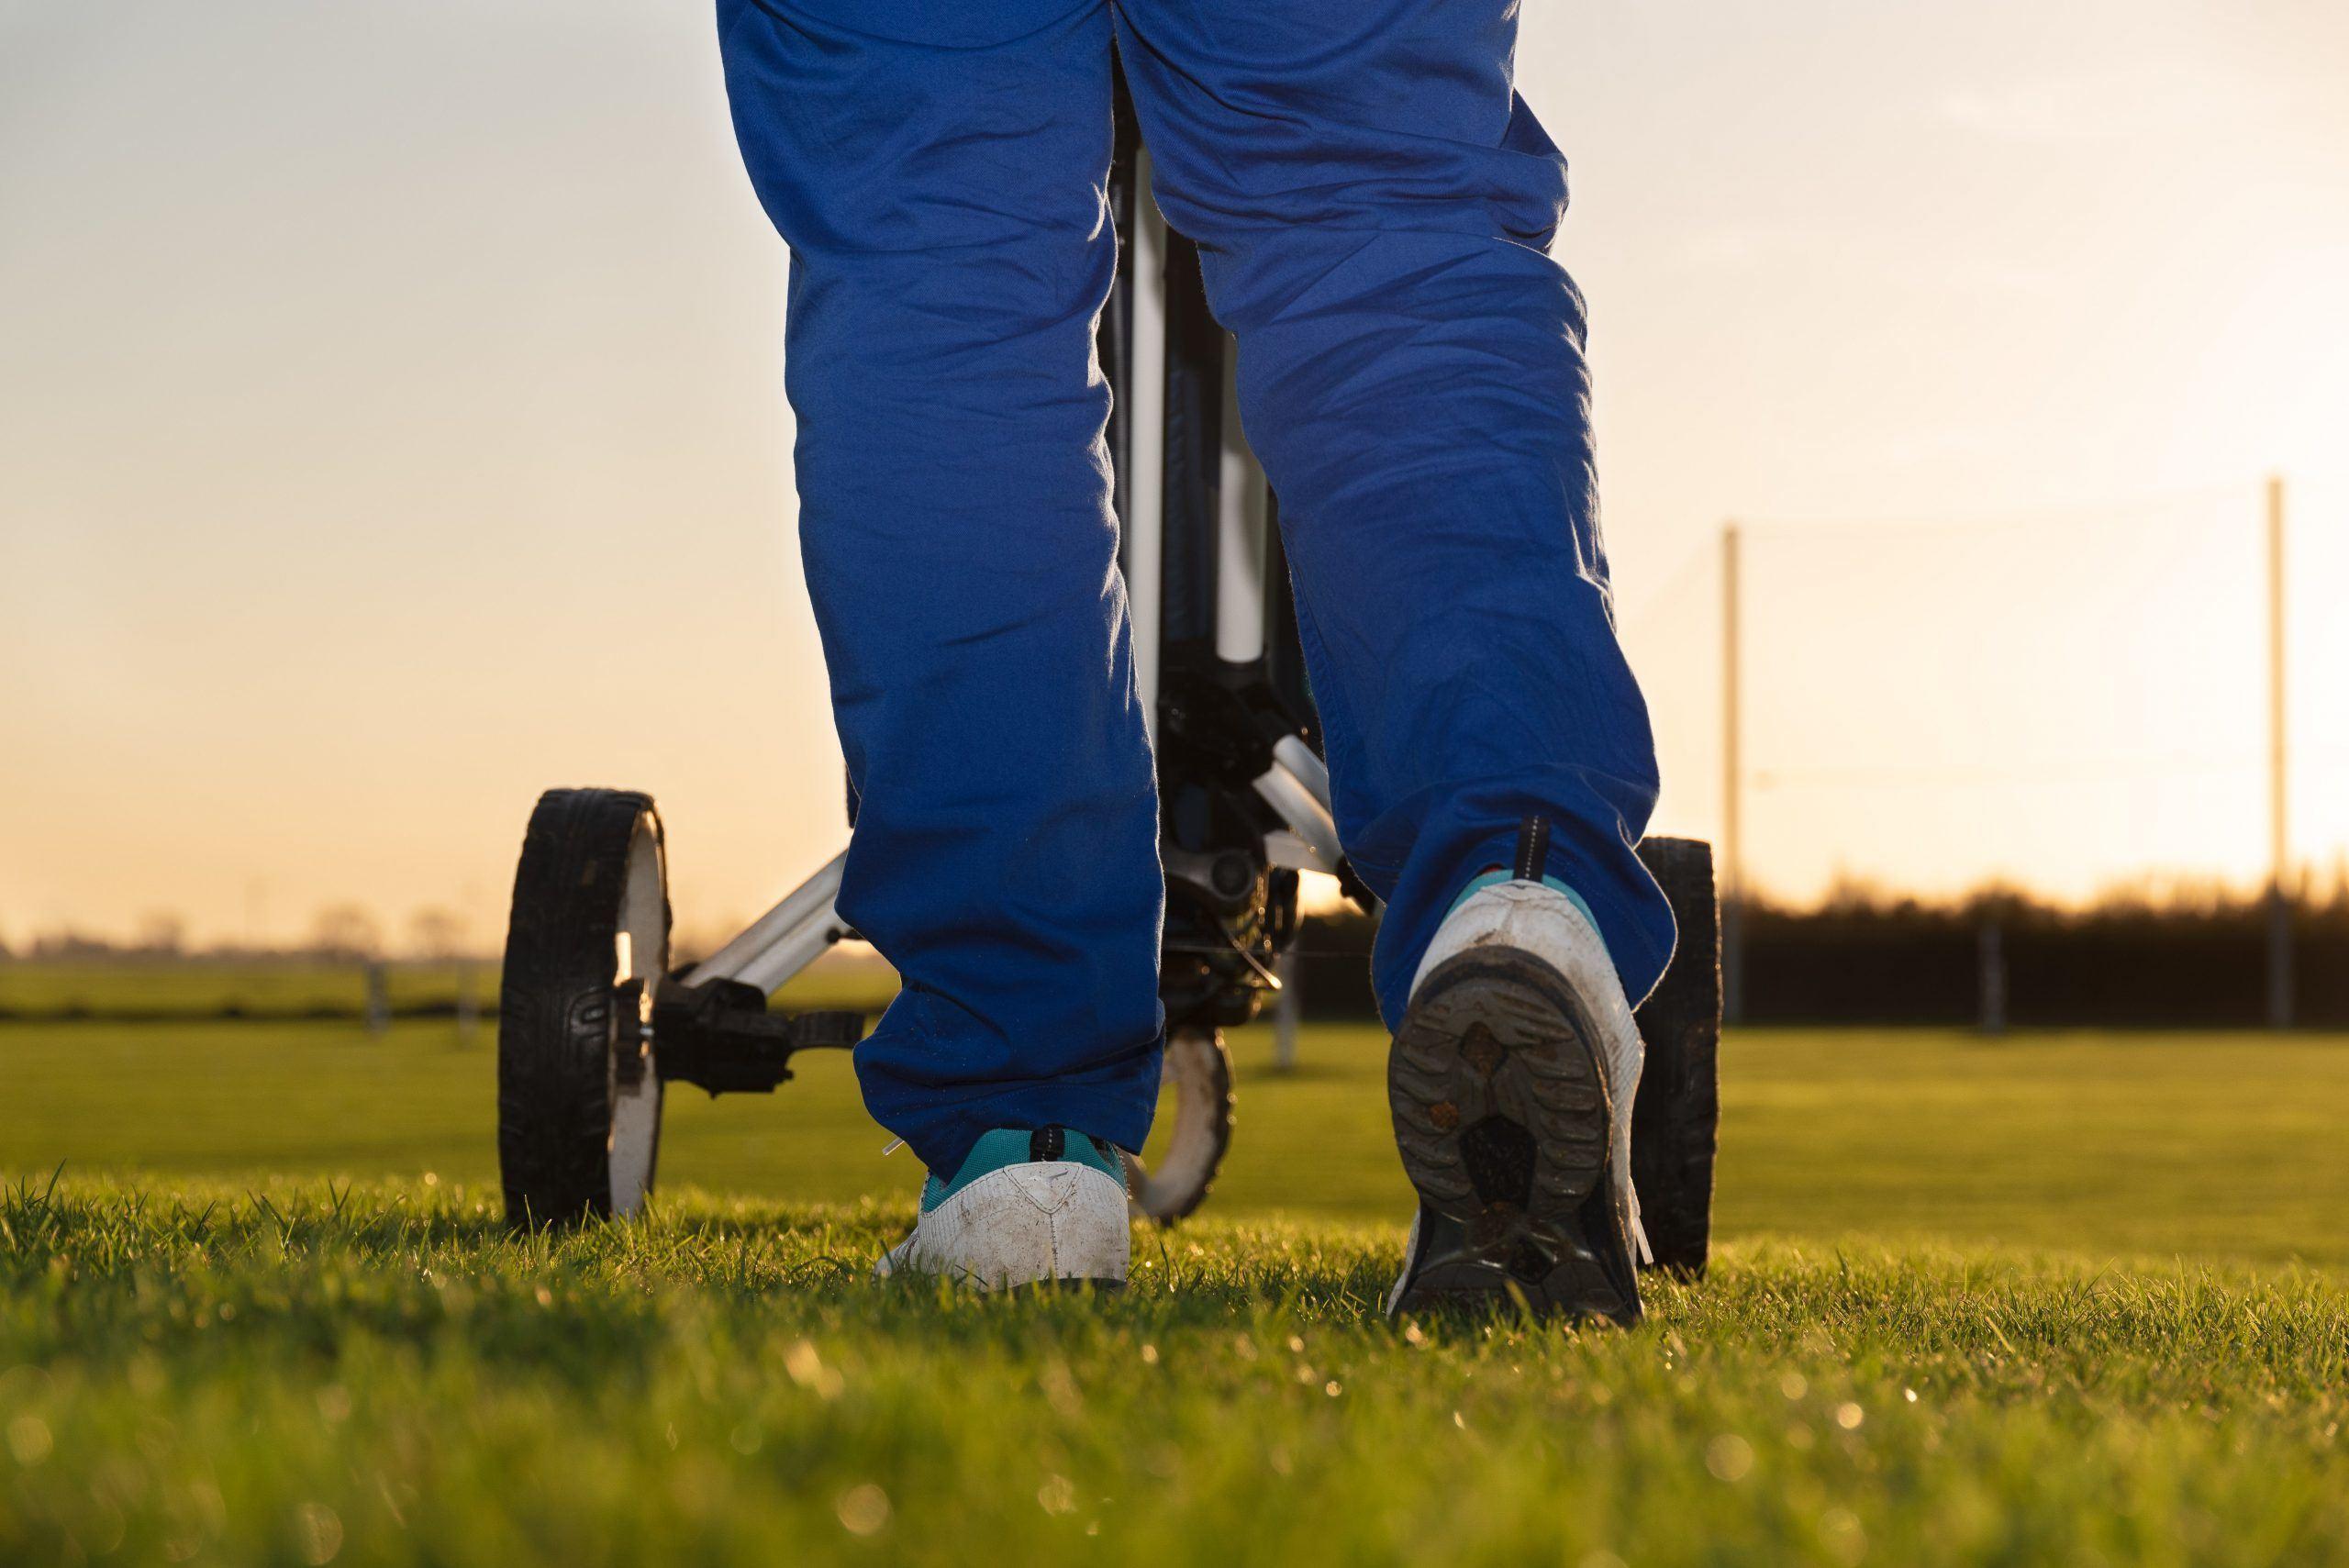 golfreportage